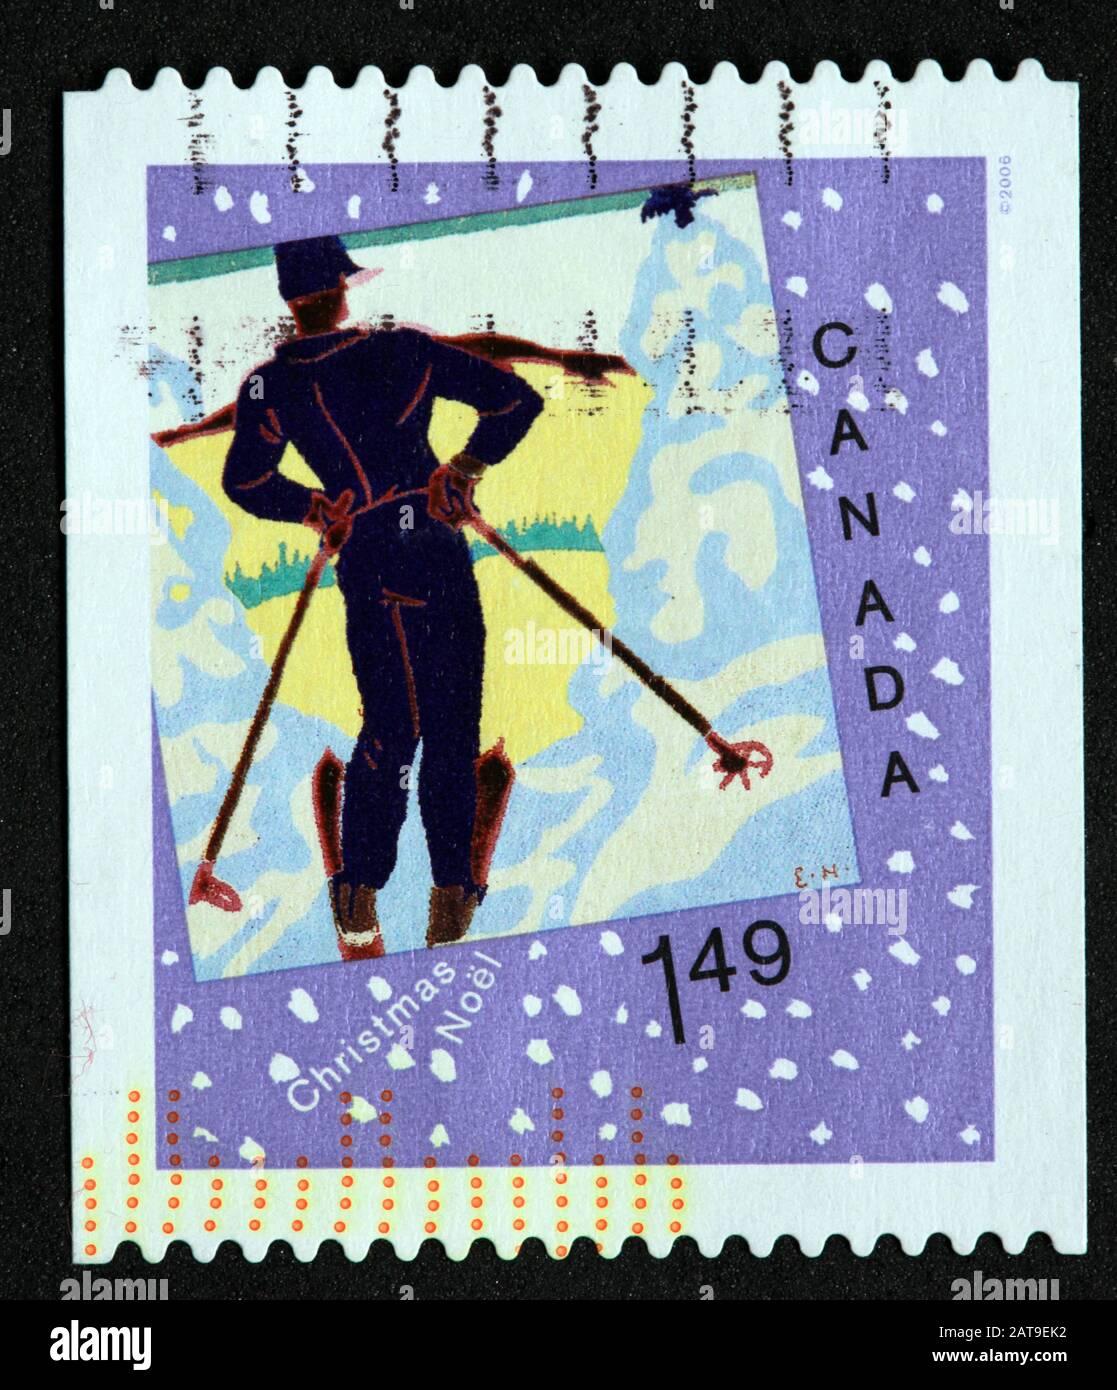 Hotpixuk,@Hotpixuk,GoTonySmith,stamp,postal,franked,frank,used stamps,used franked,used,franked stamp,from envelope,history,historic,old,poste,post office,communications,postage,sending letters,sending,parcels,1.49,$1.49,Christmas,Noel,skier,ski,$1.49 stamp,ski stamp,winter sports,Canadian